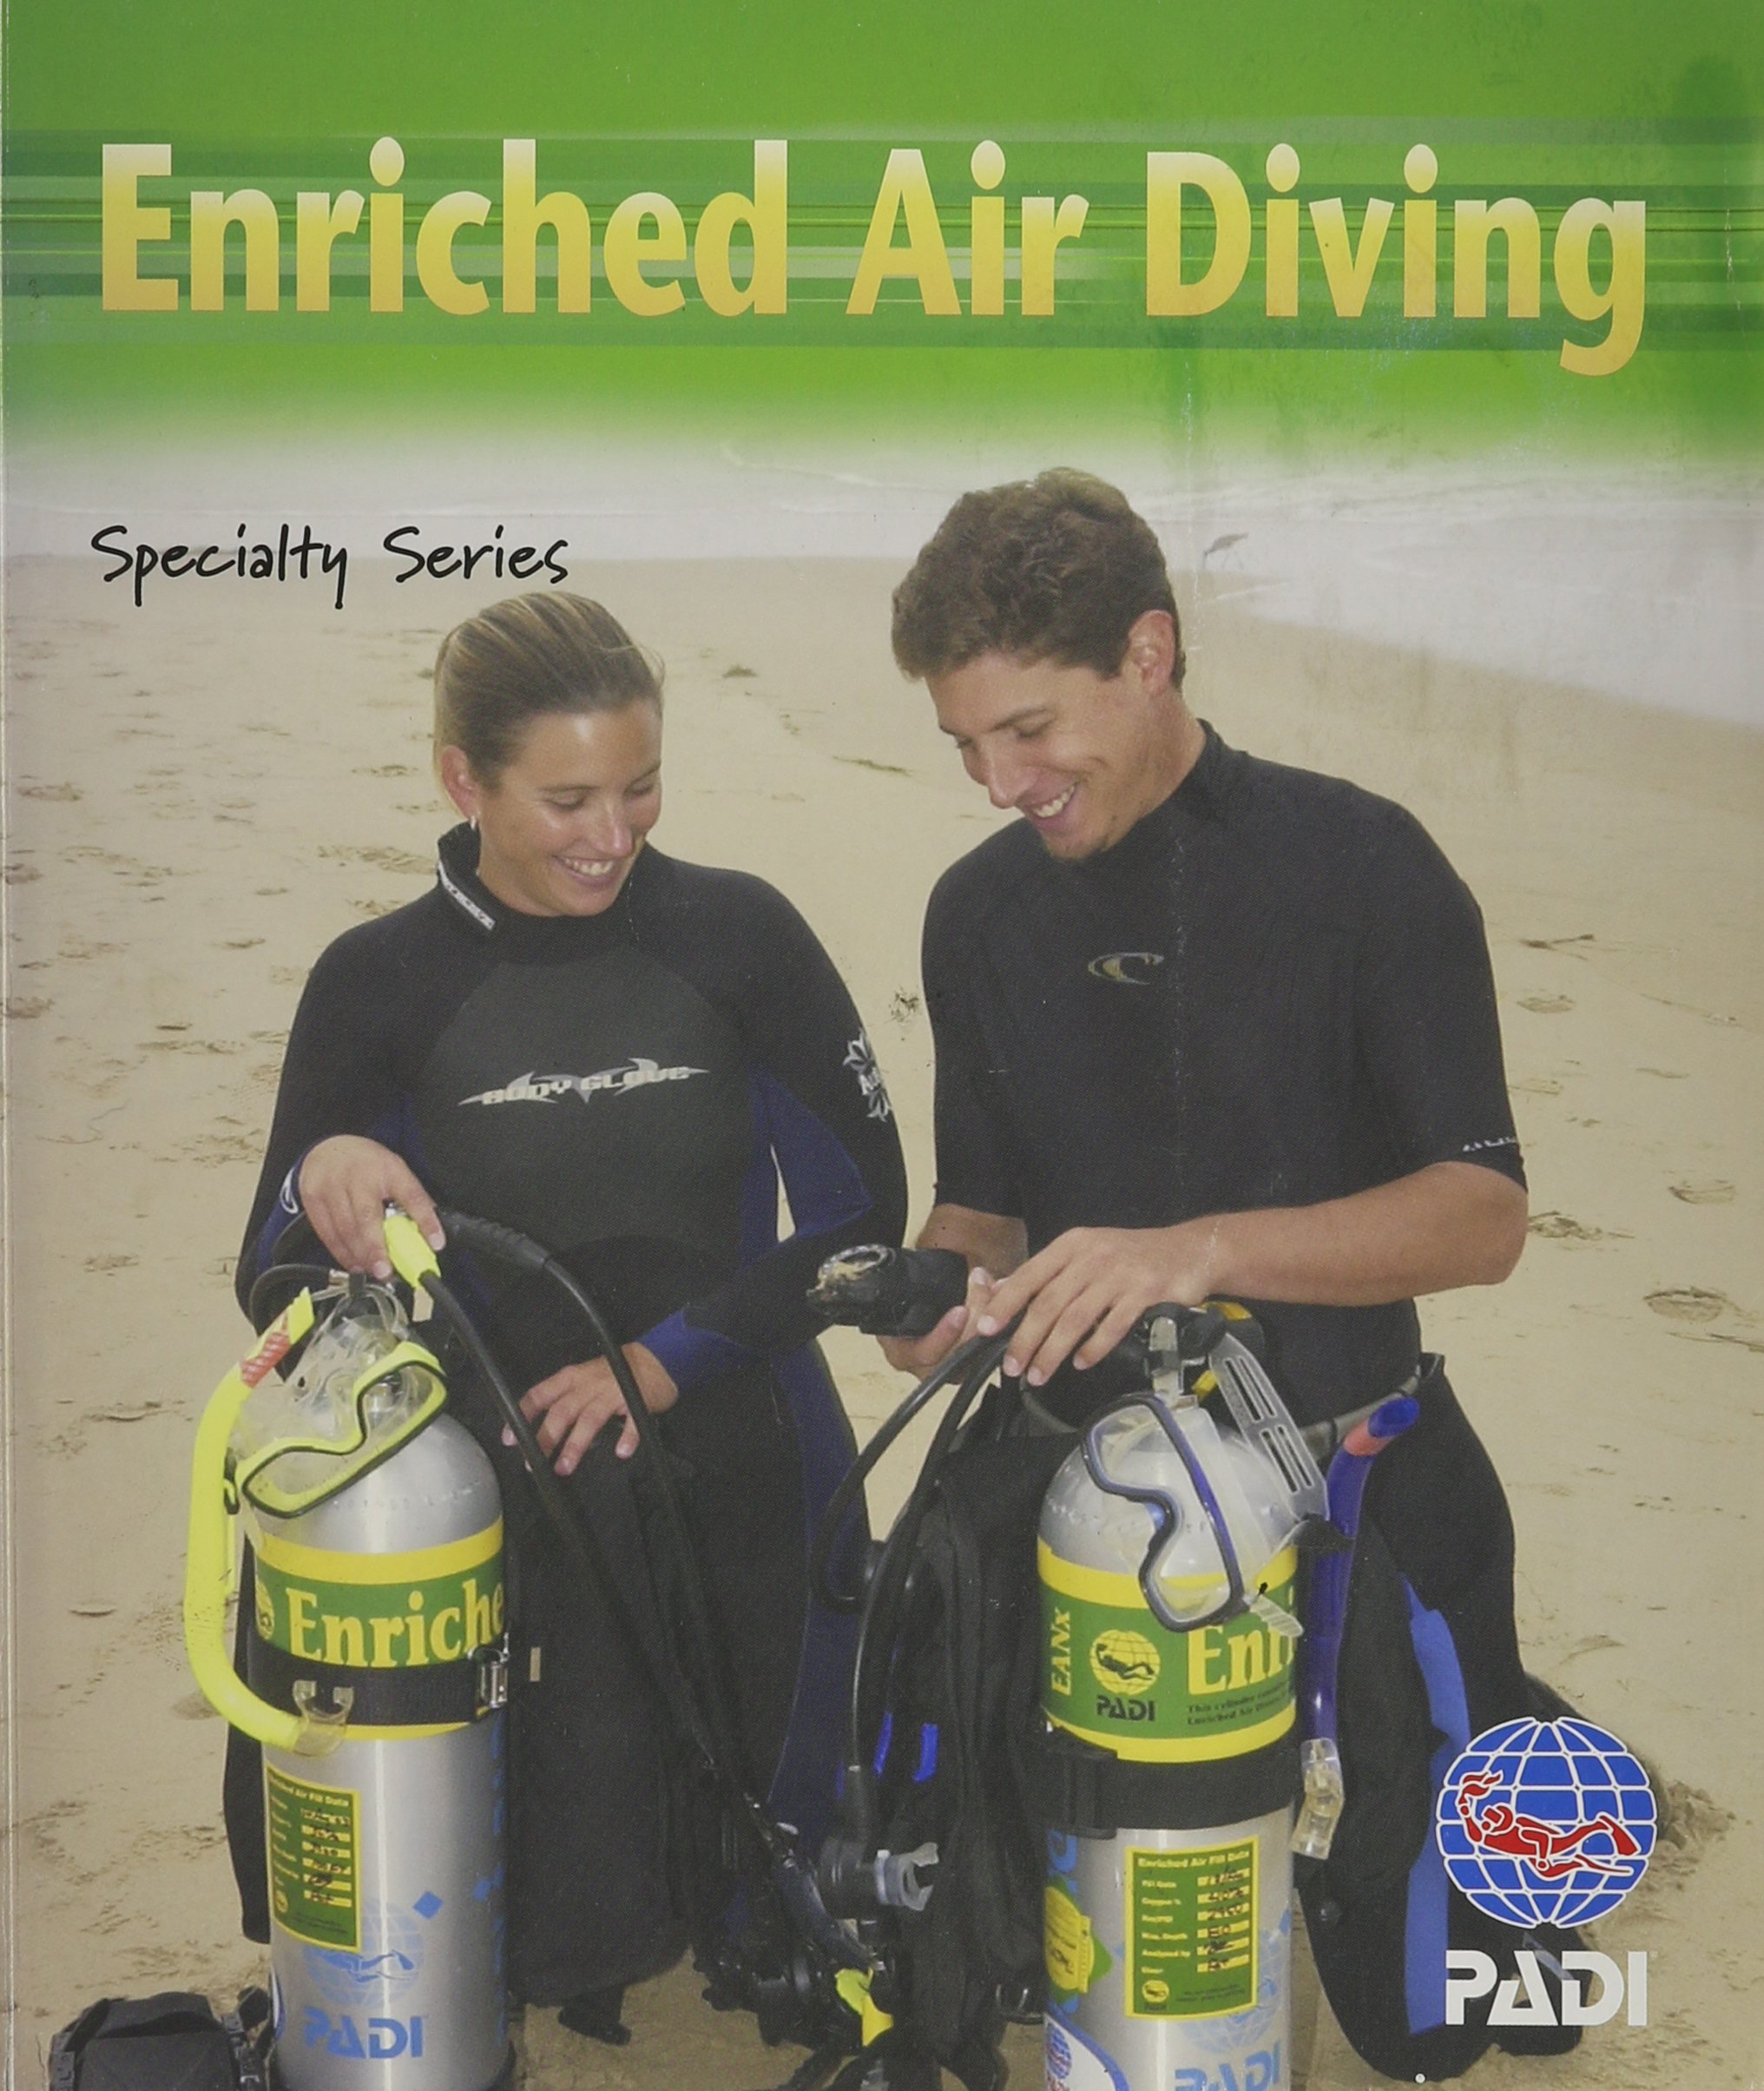 Enriched Air Diving: PADI Specialty Series pdf